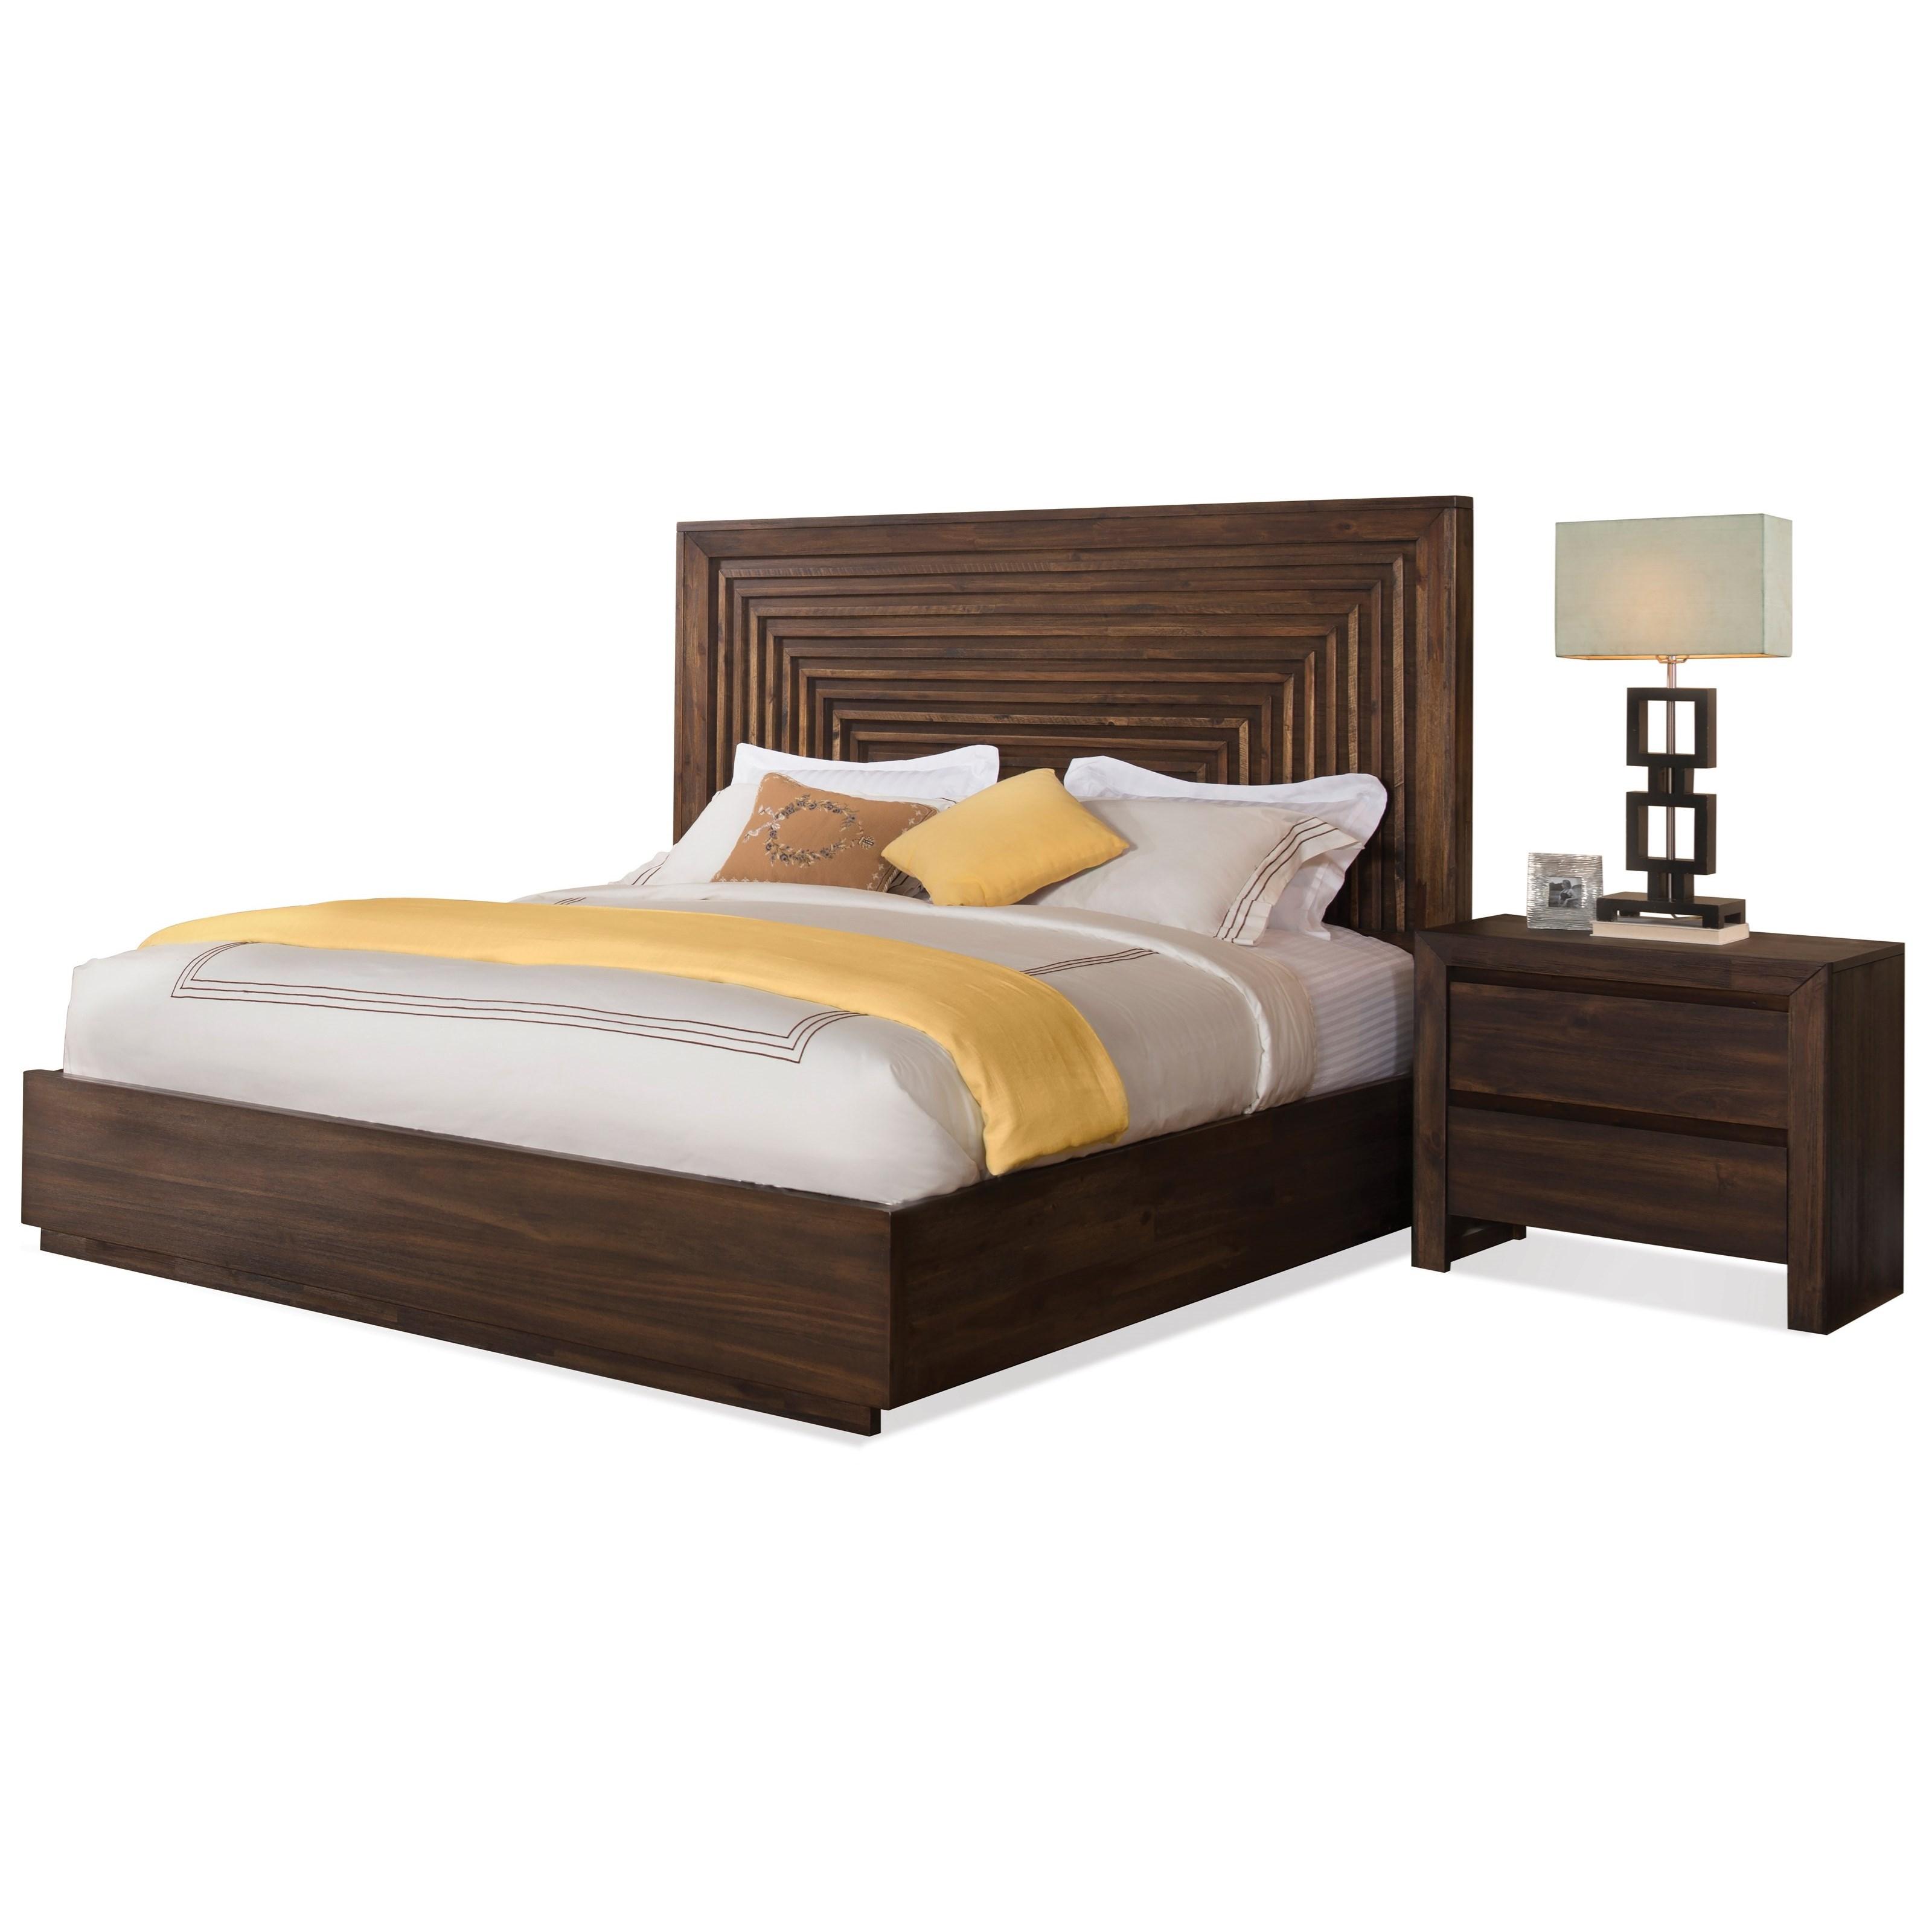 Riverside furniture modern gatherings queen bedroom group for Bedroom groups